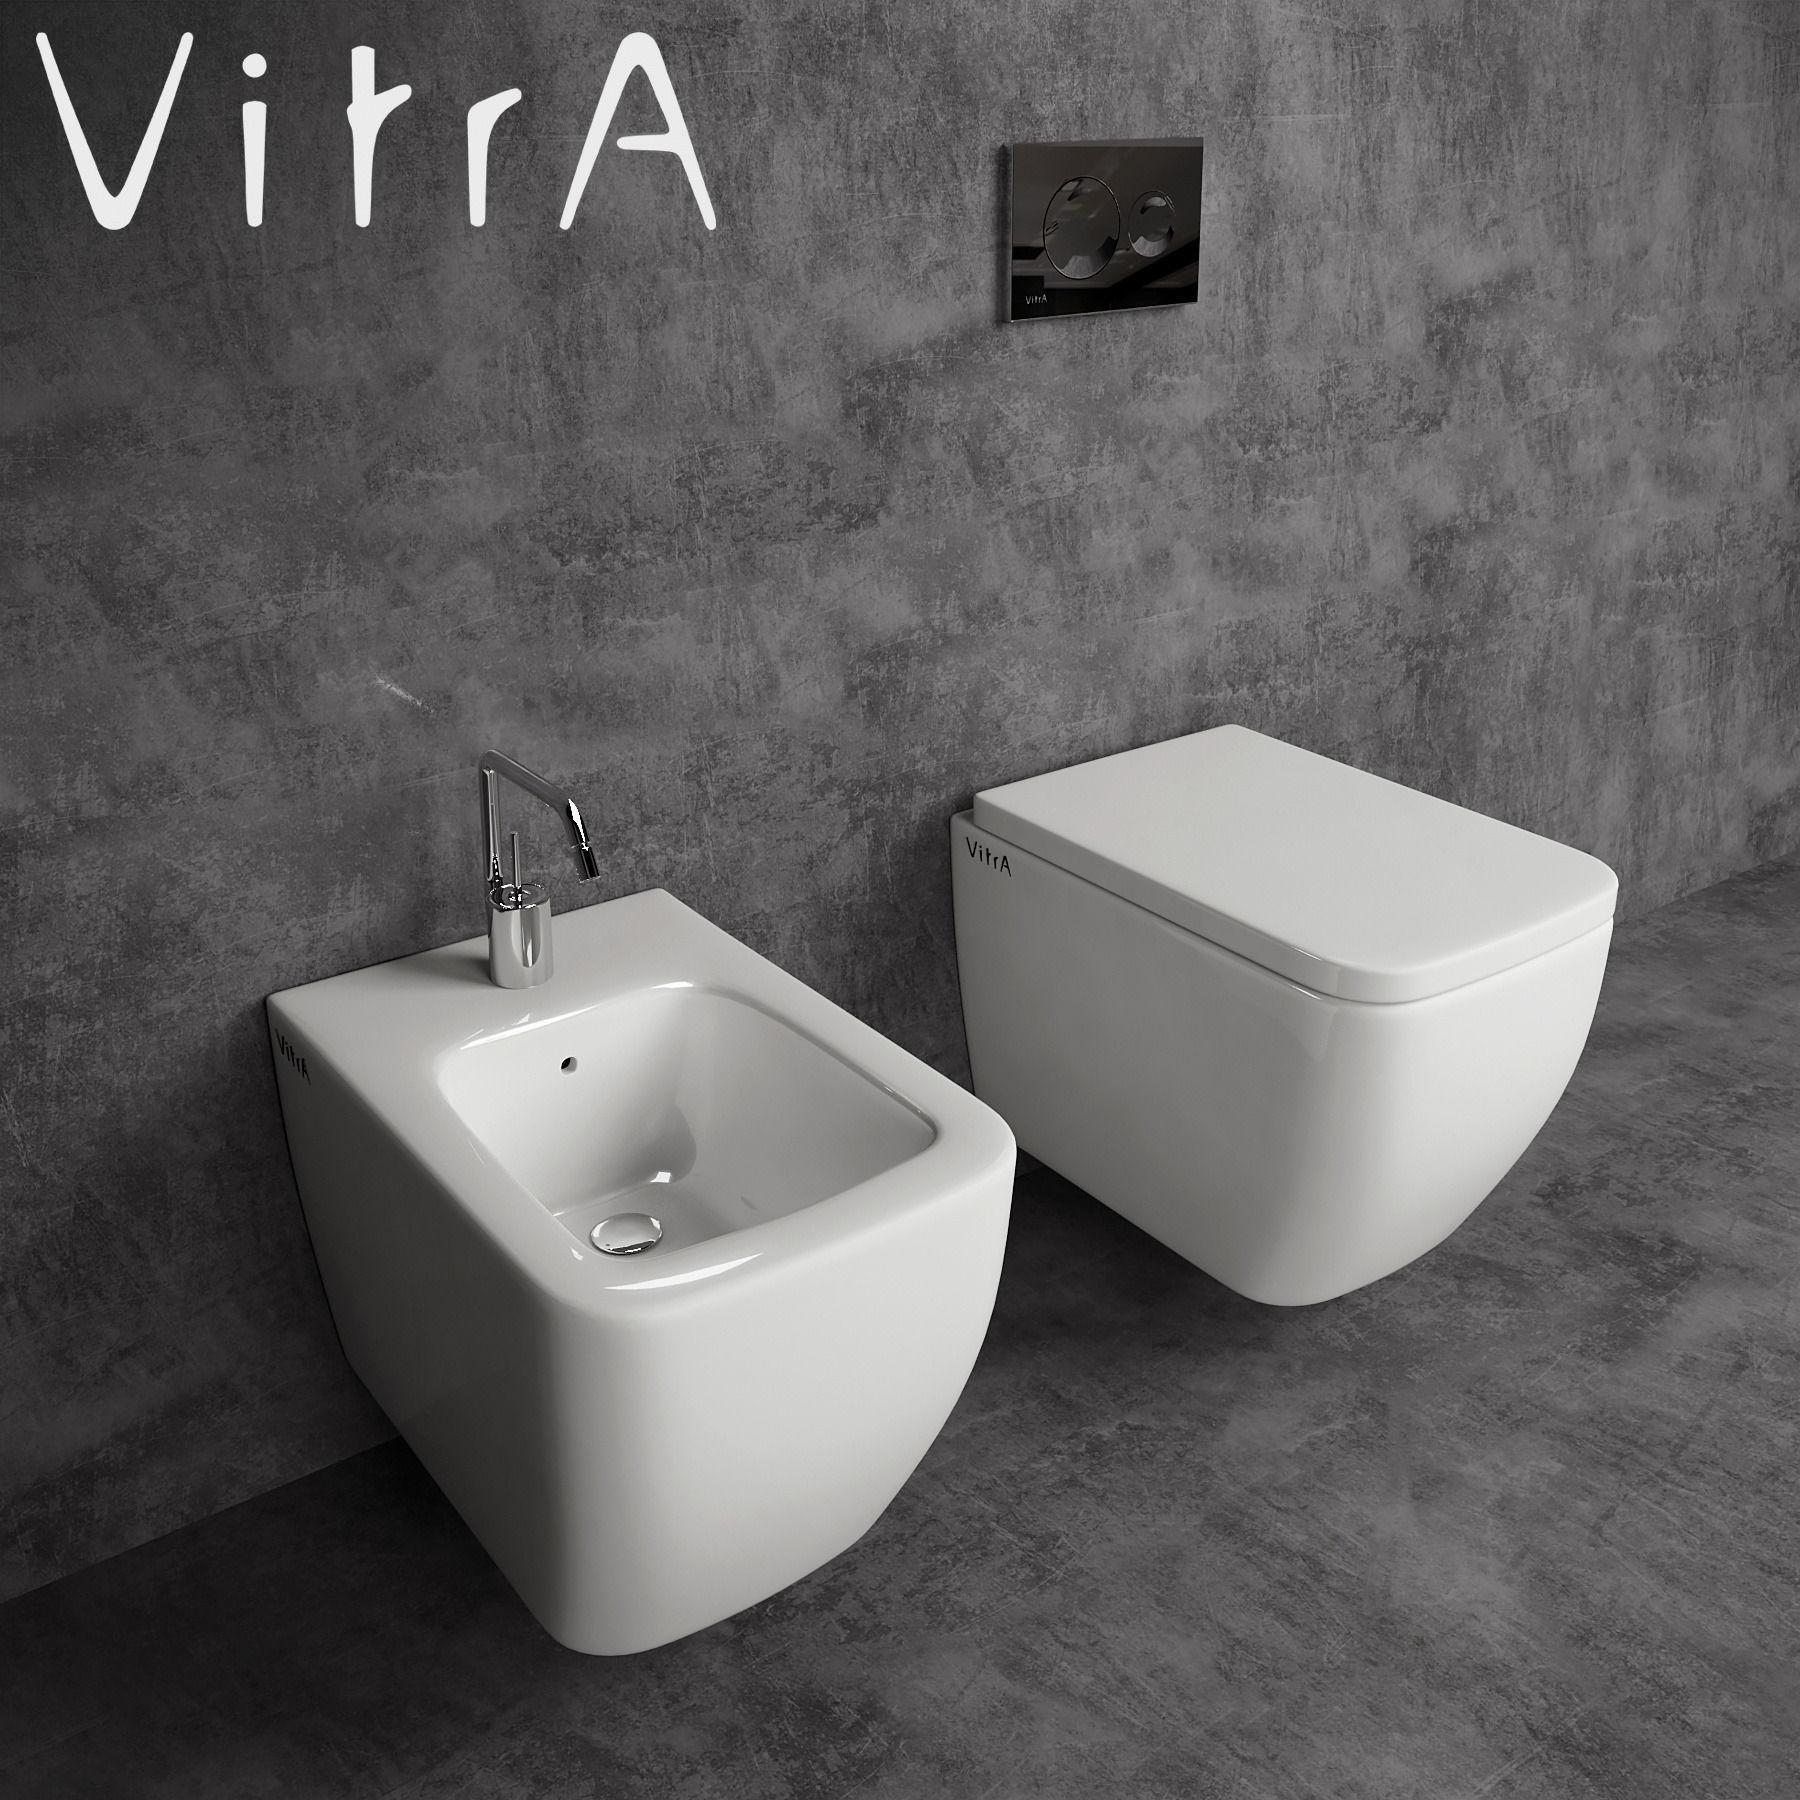 toilet and bidet vitra shift 3d model max. Black Bedroom Furniture Sets. Home Design Ideas